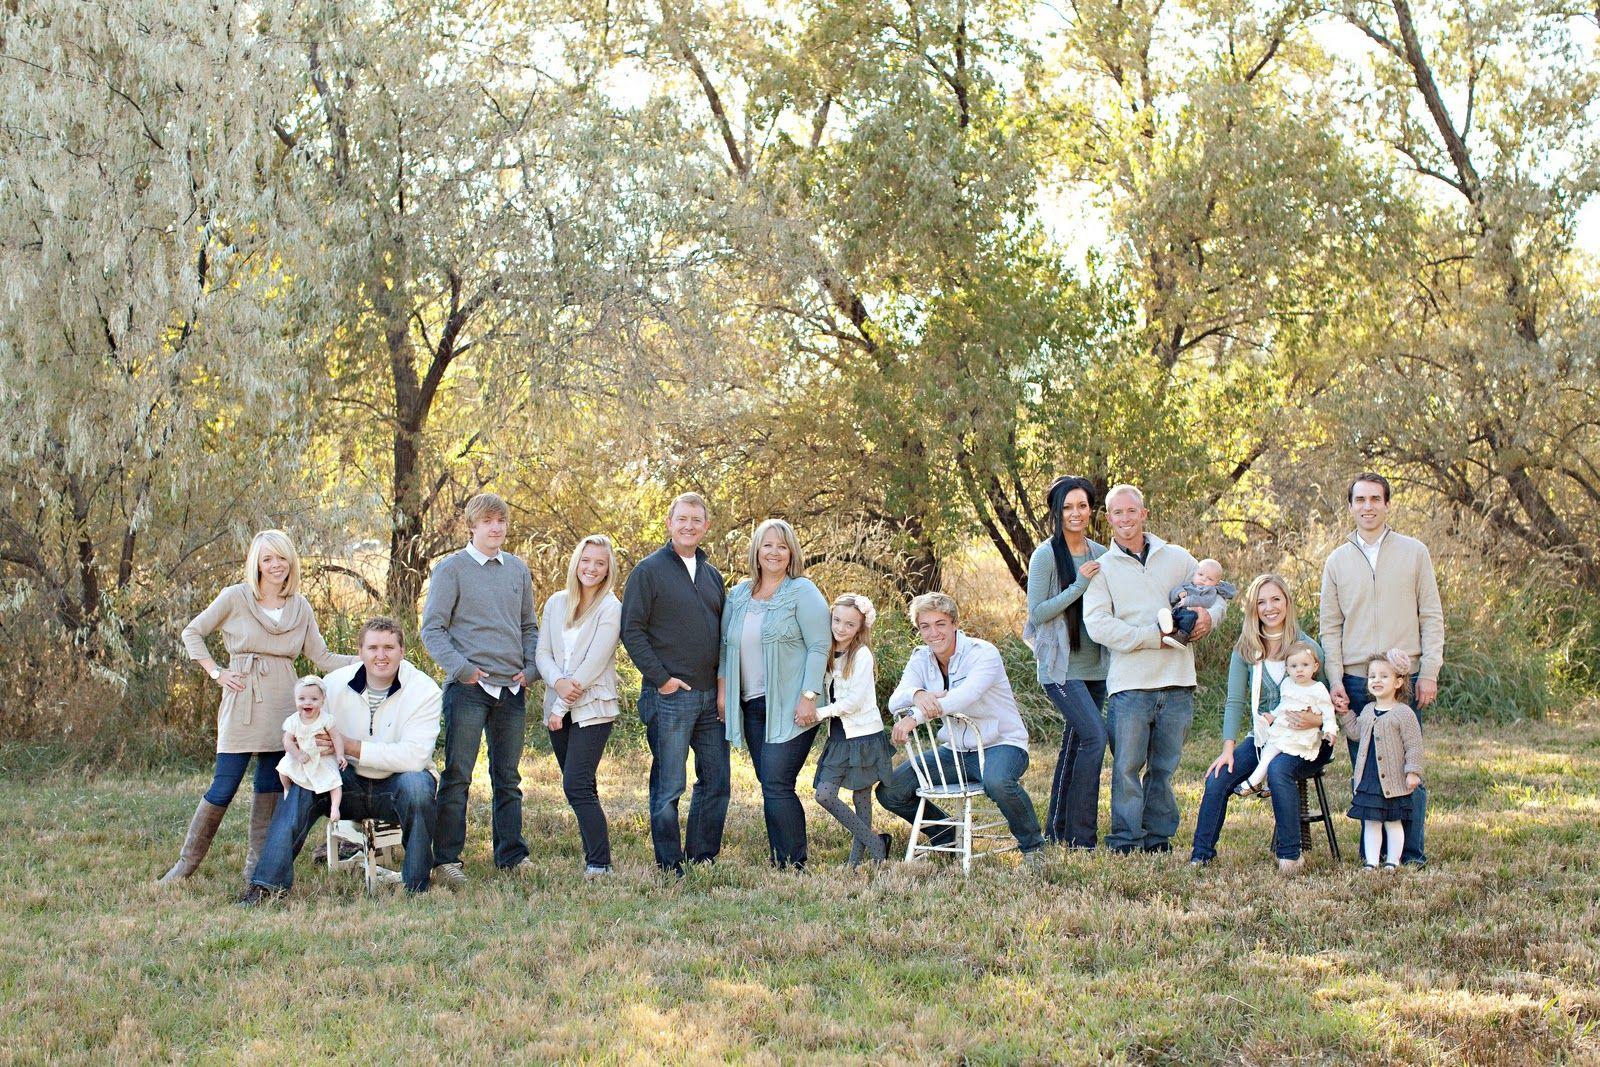 Large family pose pics i like pinterest for Group pics ideas